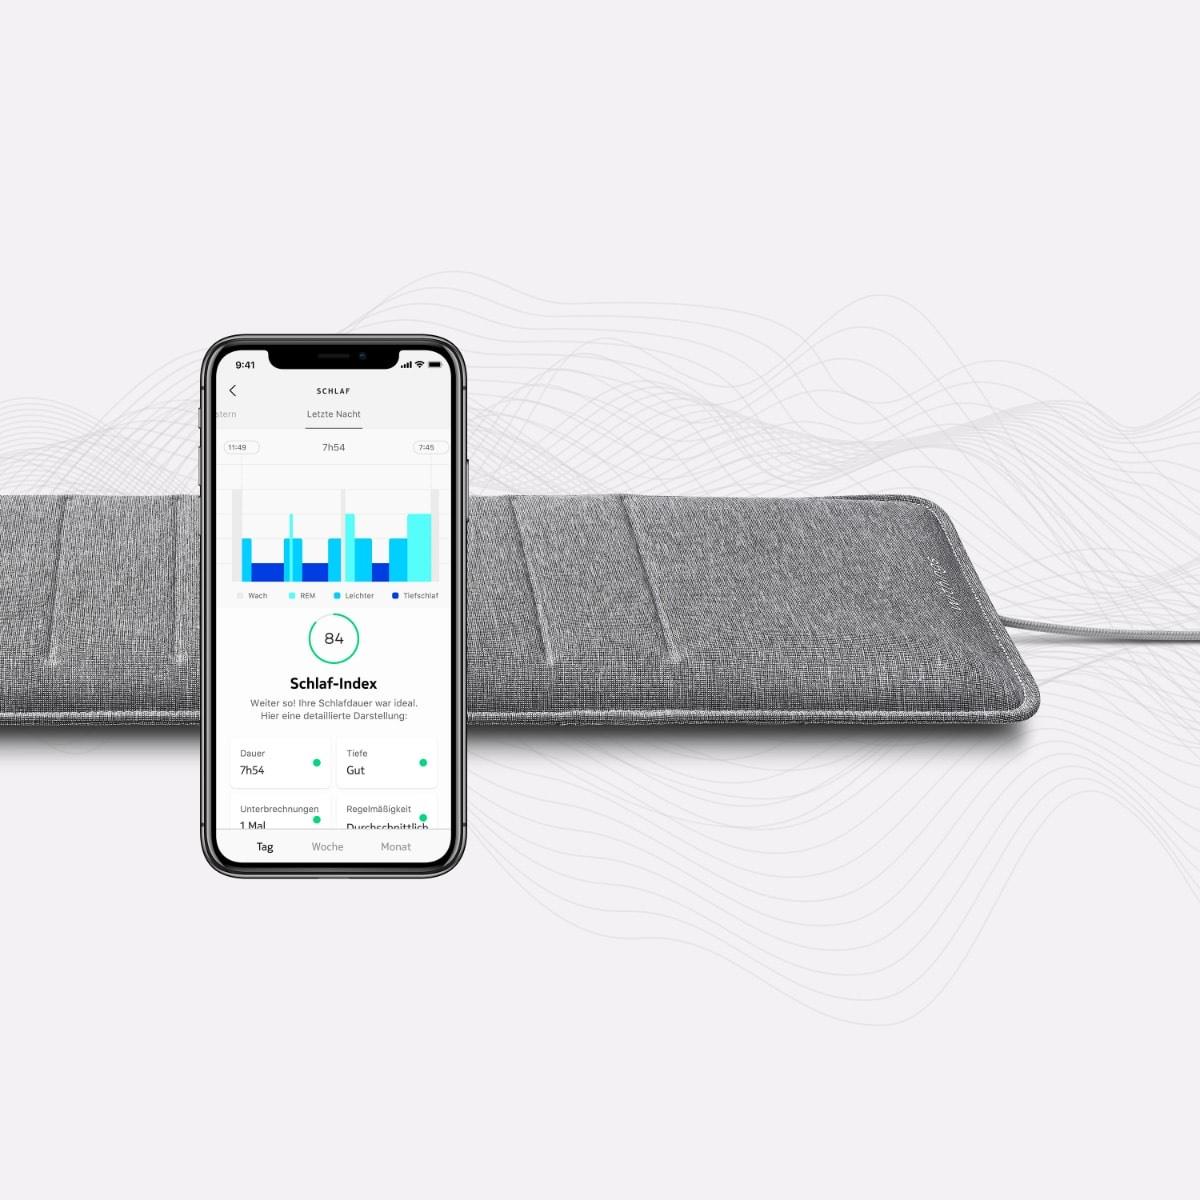 [Amazon] Withings Sleep Analyzer